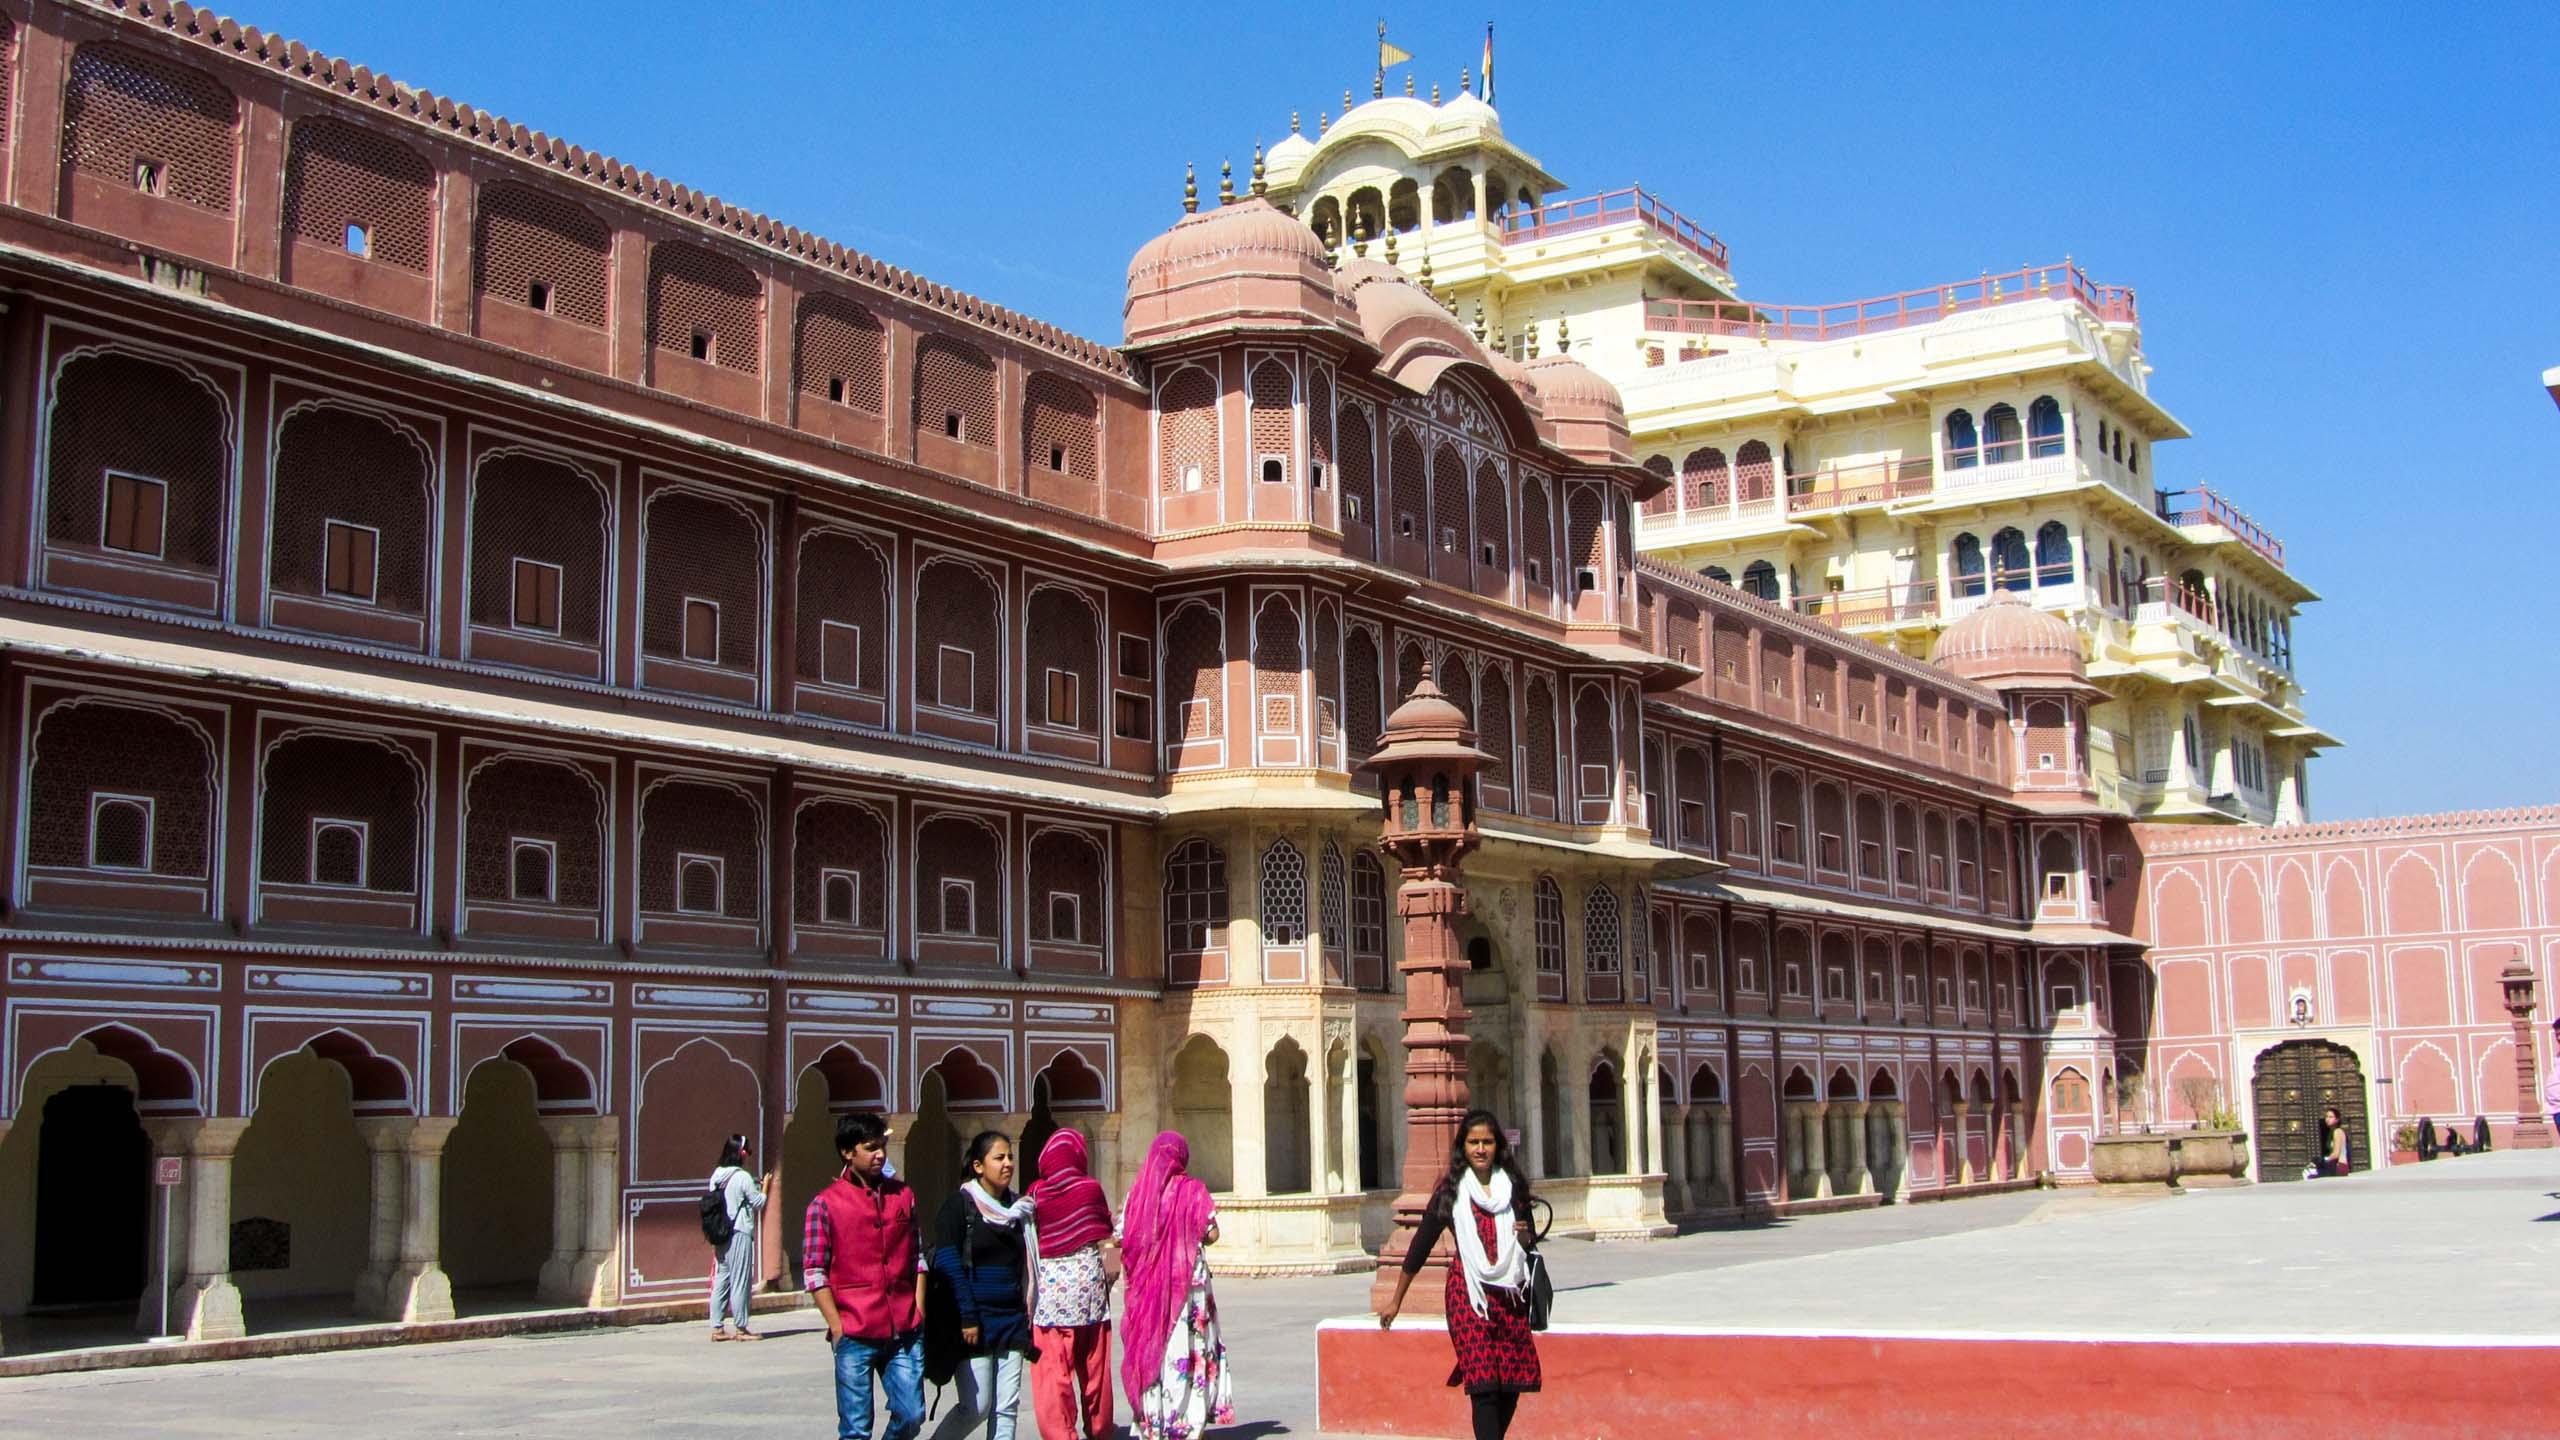 India building near plaza